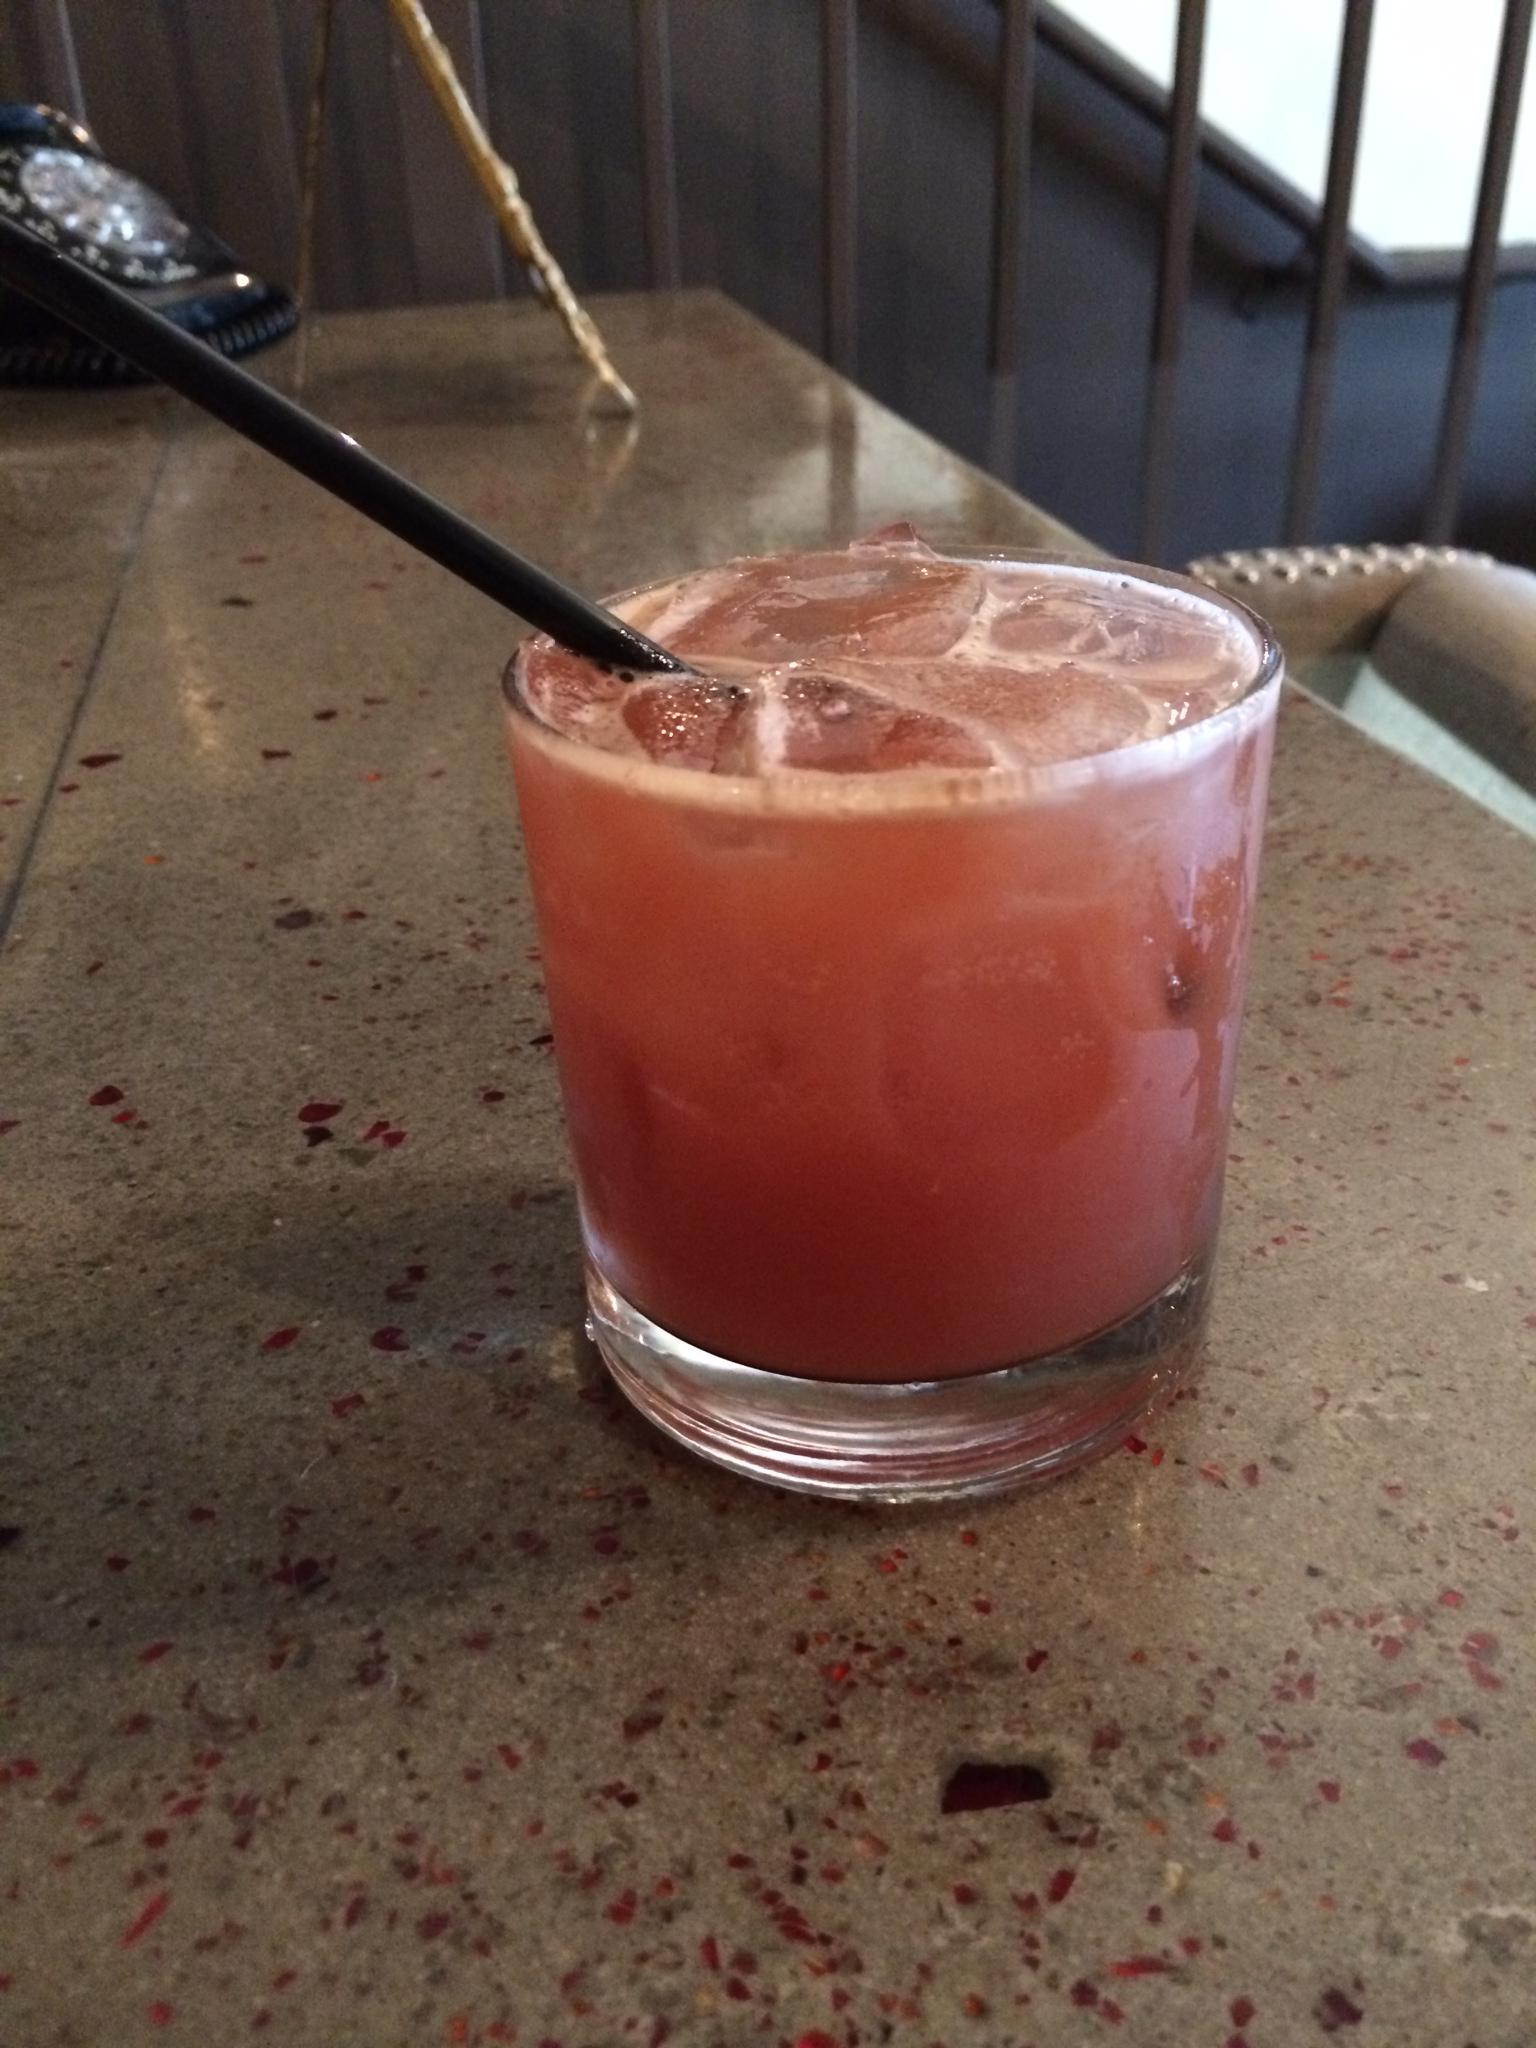 Burgundy Restaurant - Gin n' Juice